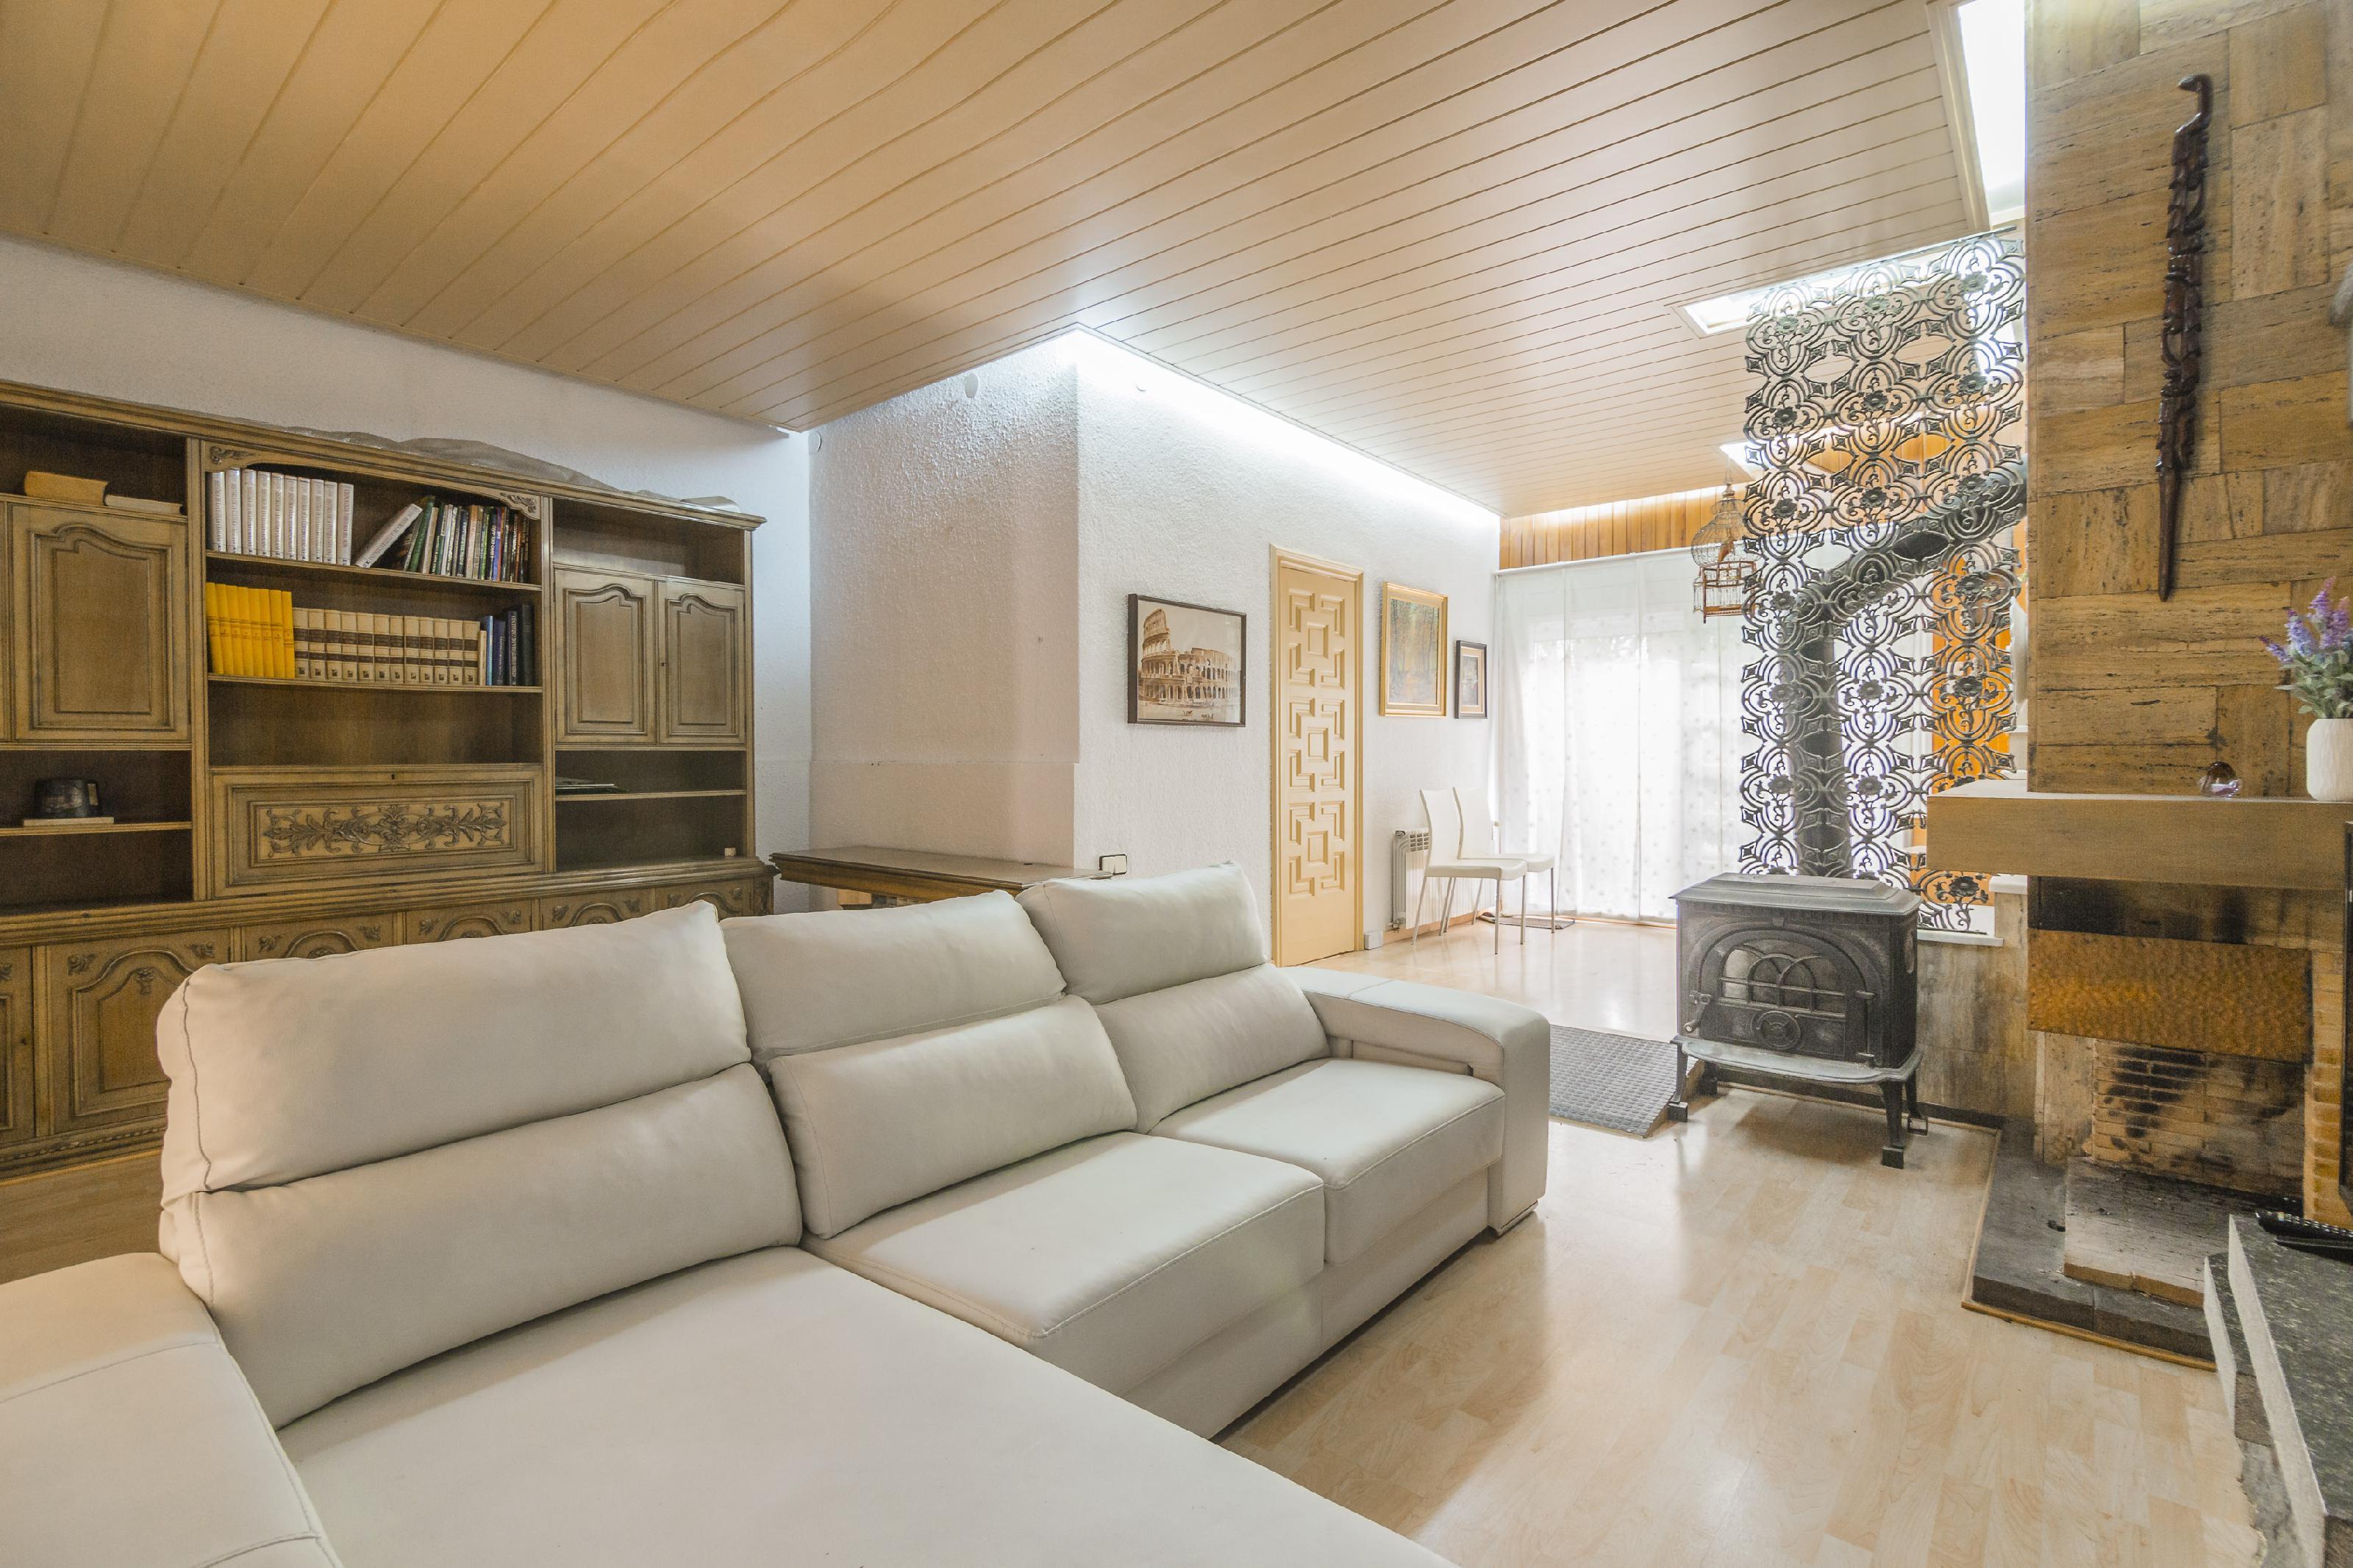 Imagen 1 Casa Pareada en venta en Barcelona / Passatge Llivia